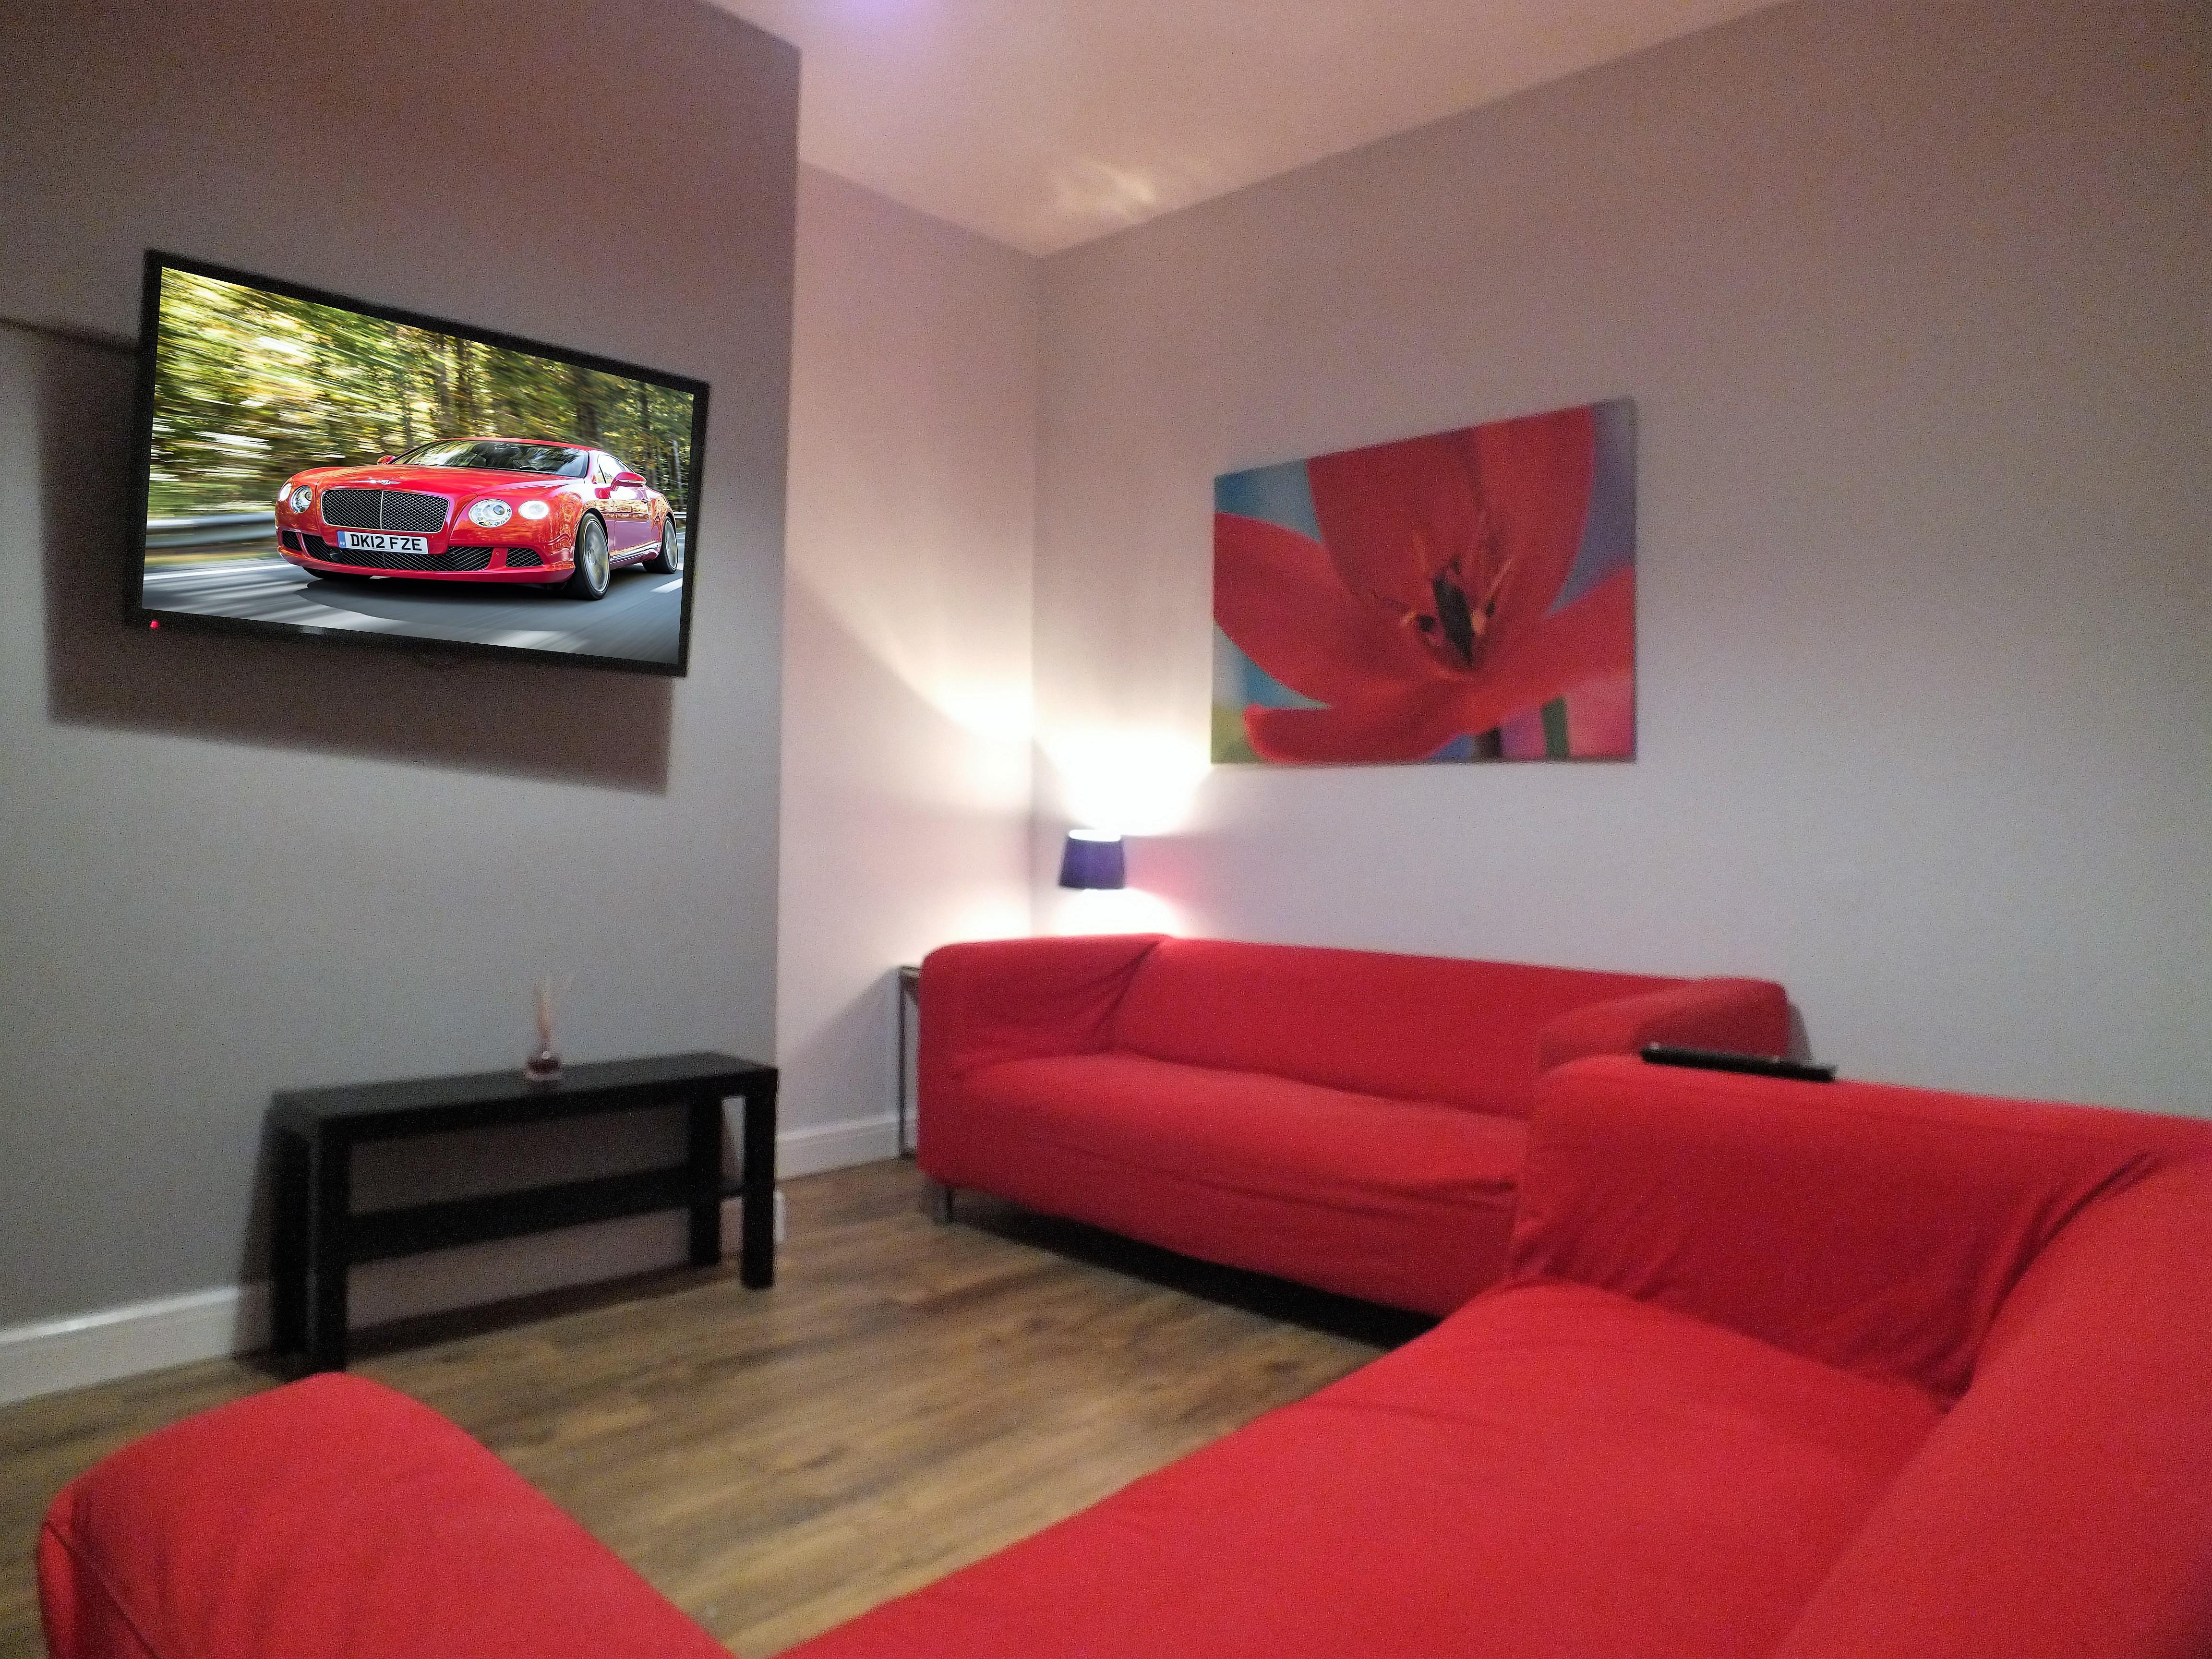 4 bed / 1.5 bath – Walthall Street, Crewe (all bills included!)